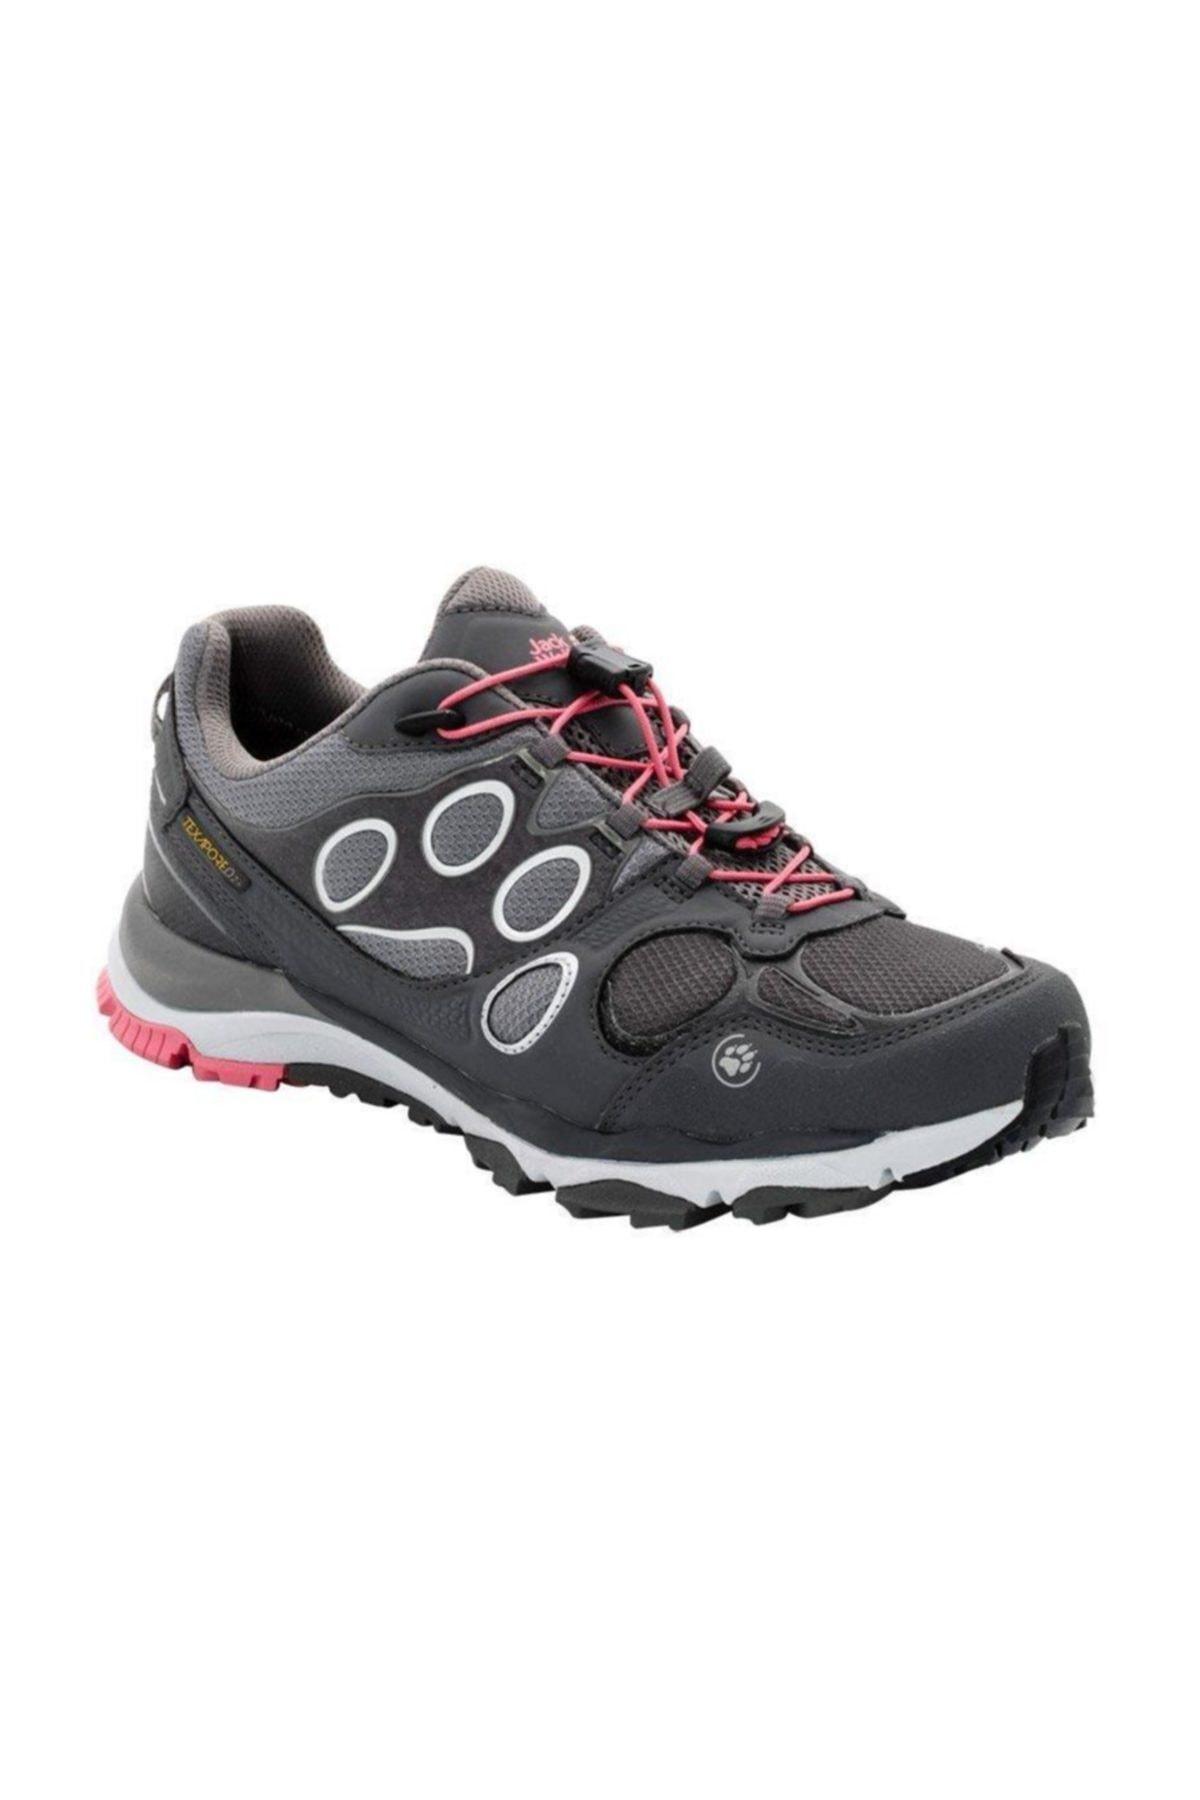 Jack Wolfskin Trail Excite Texapore Low Kadın Ayakkabısı - 4018761-2099 1